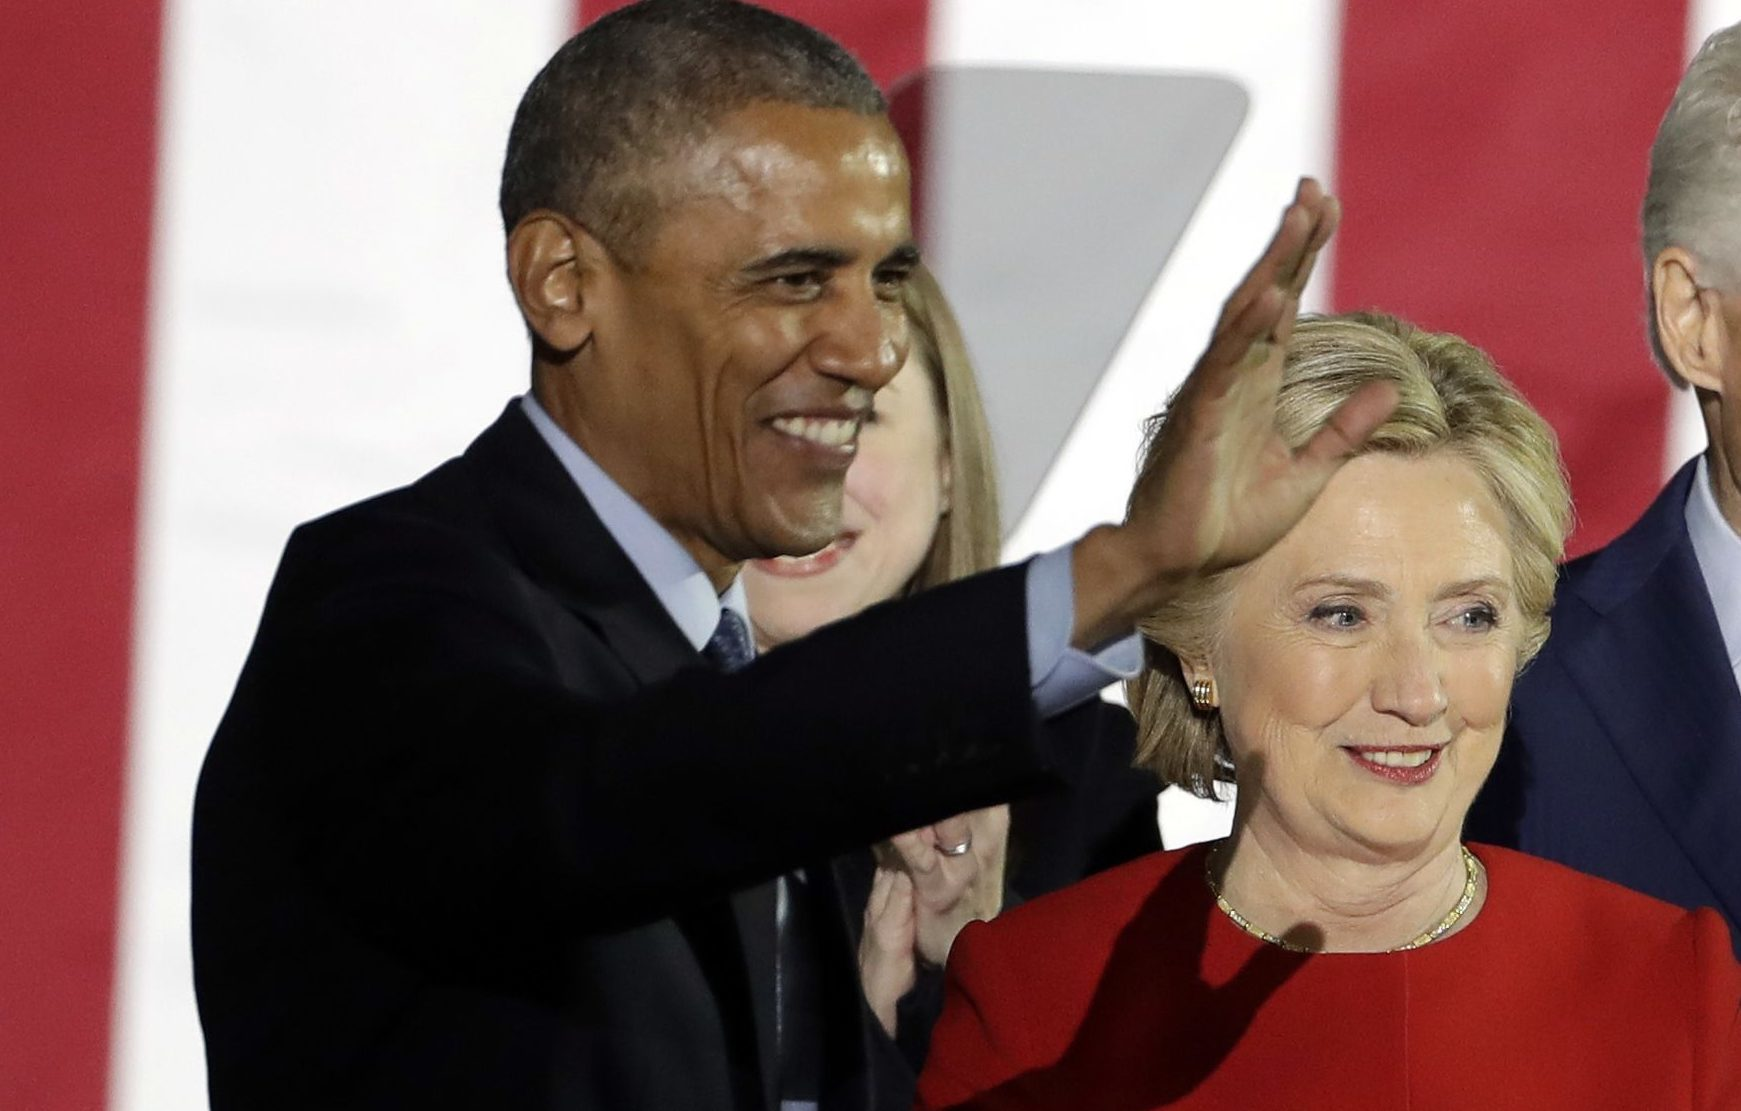 Barack Obama and Hillary Clinton (AP Photo/Matt Slocum)